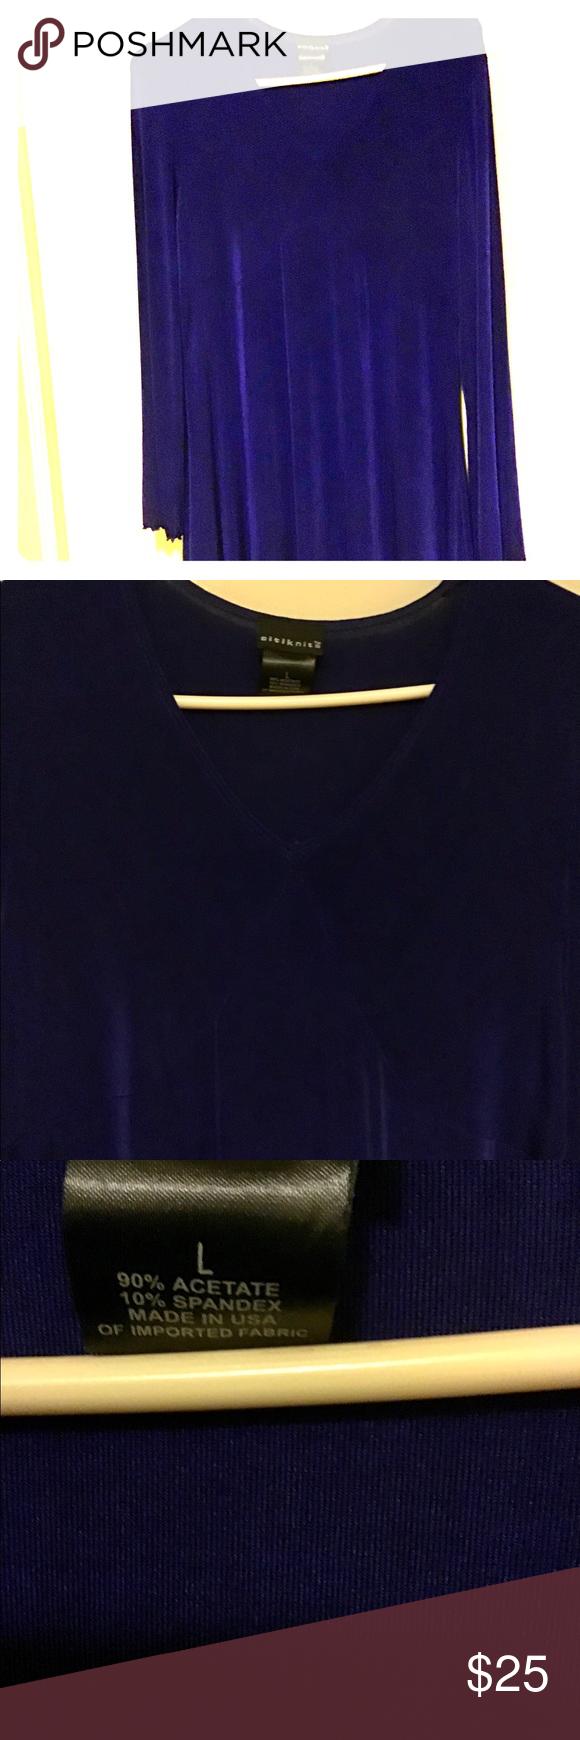 Royal Blue Citi Knits Tunic (With images) Knit tunic